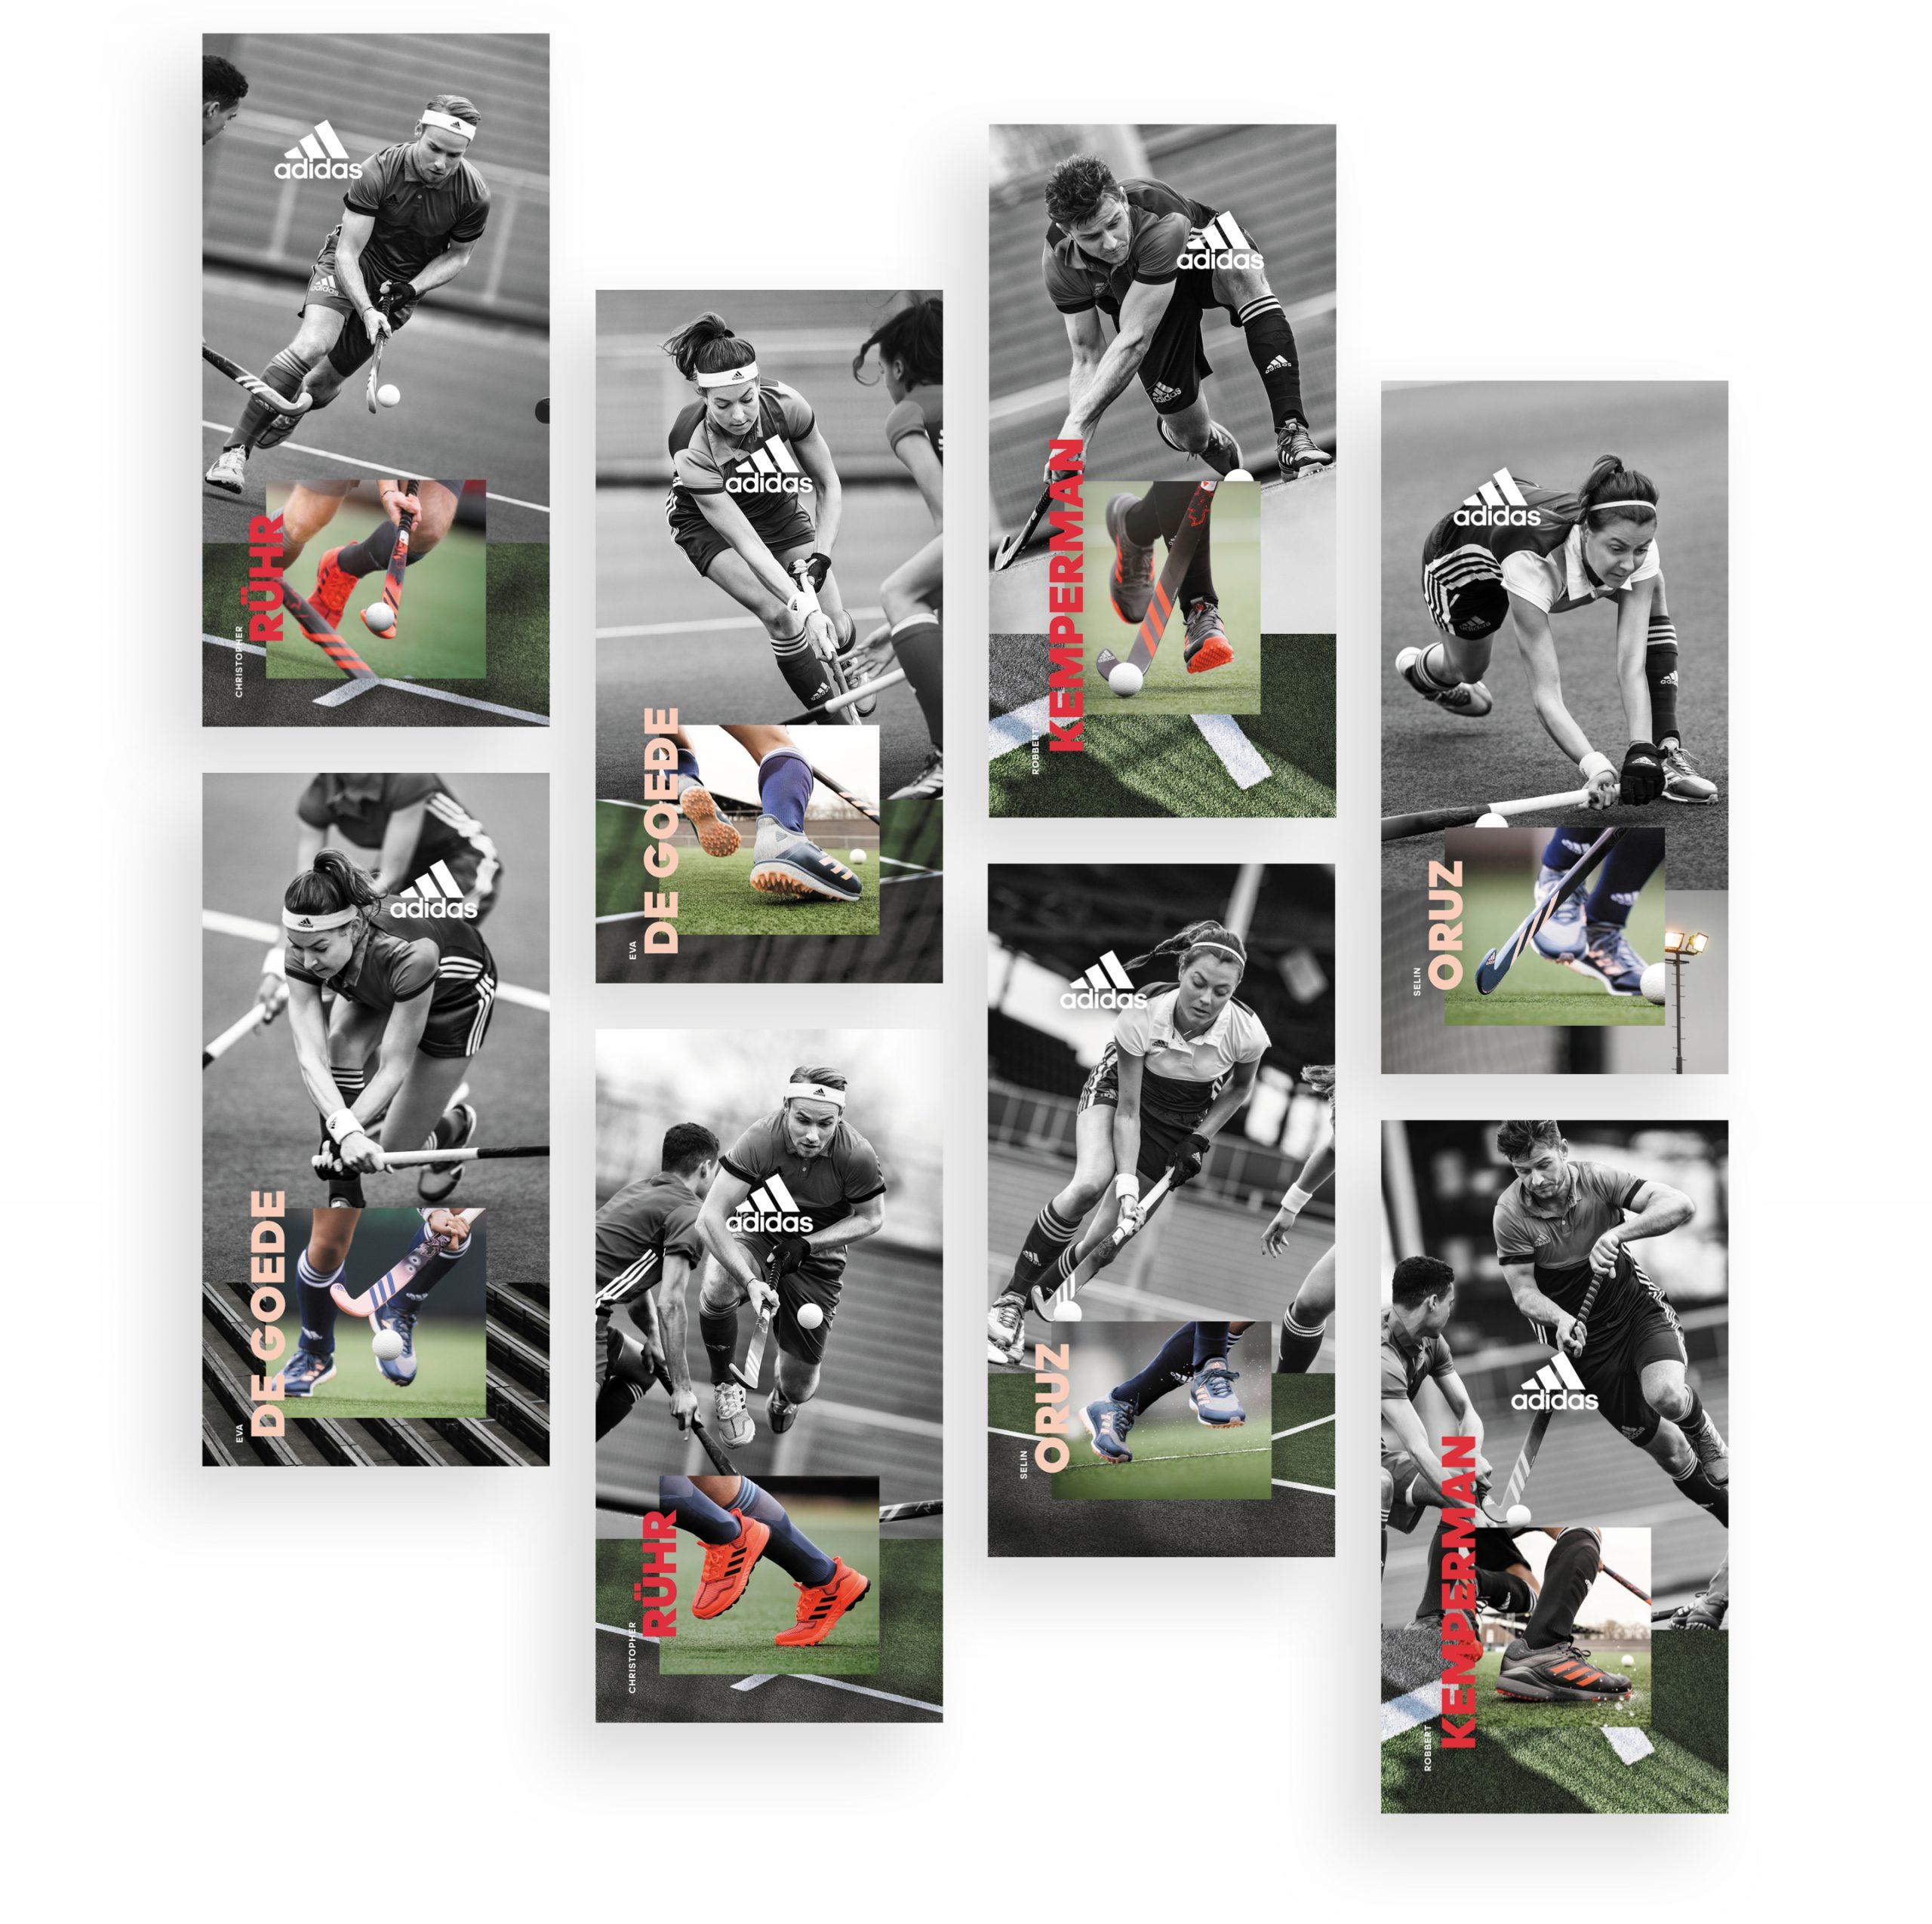 pascher-heinz-adidas-world-cup-layout-02